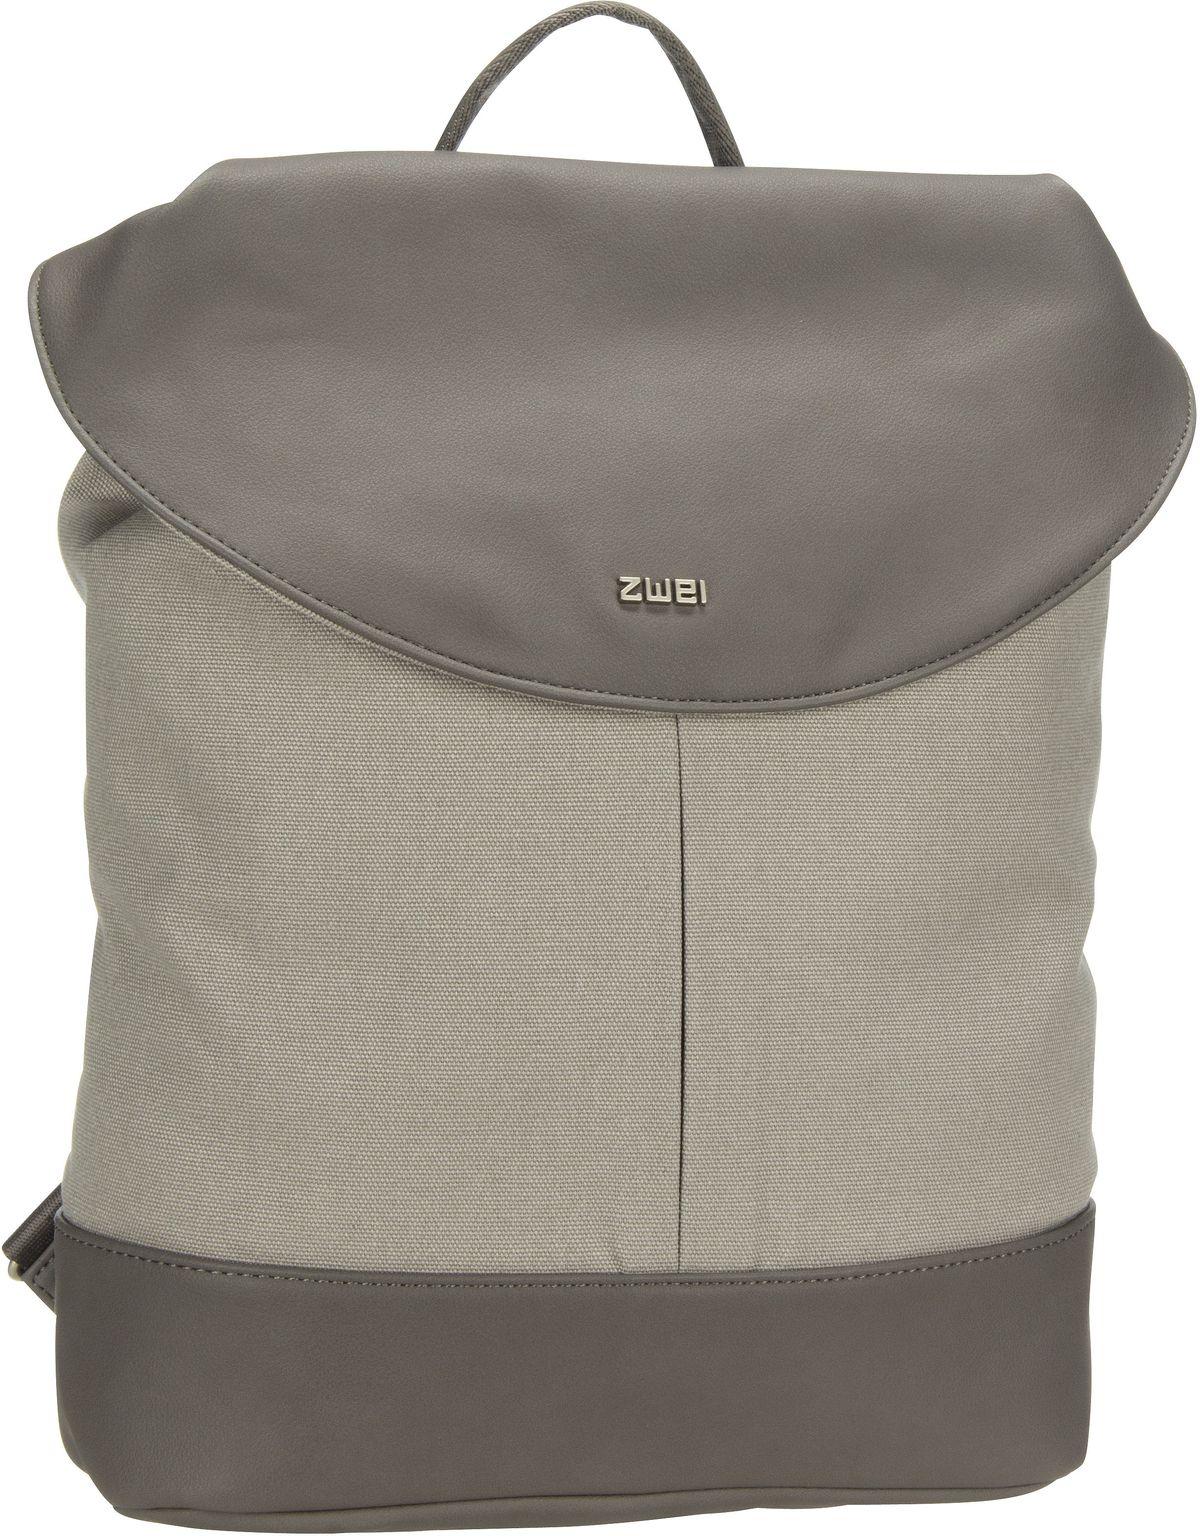 Rucksack / Daypack Paula PAR120 Grey (11 Liter)